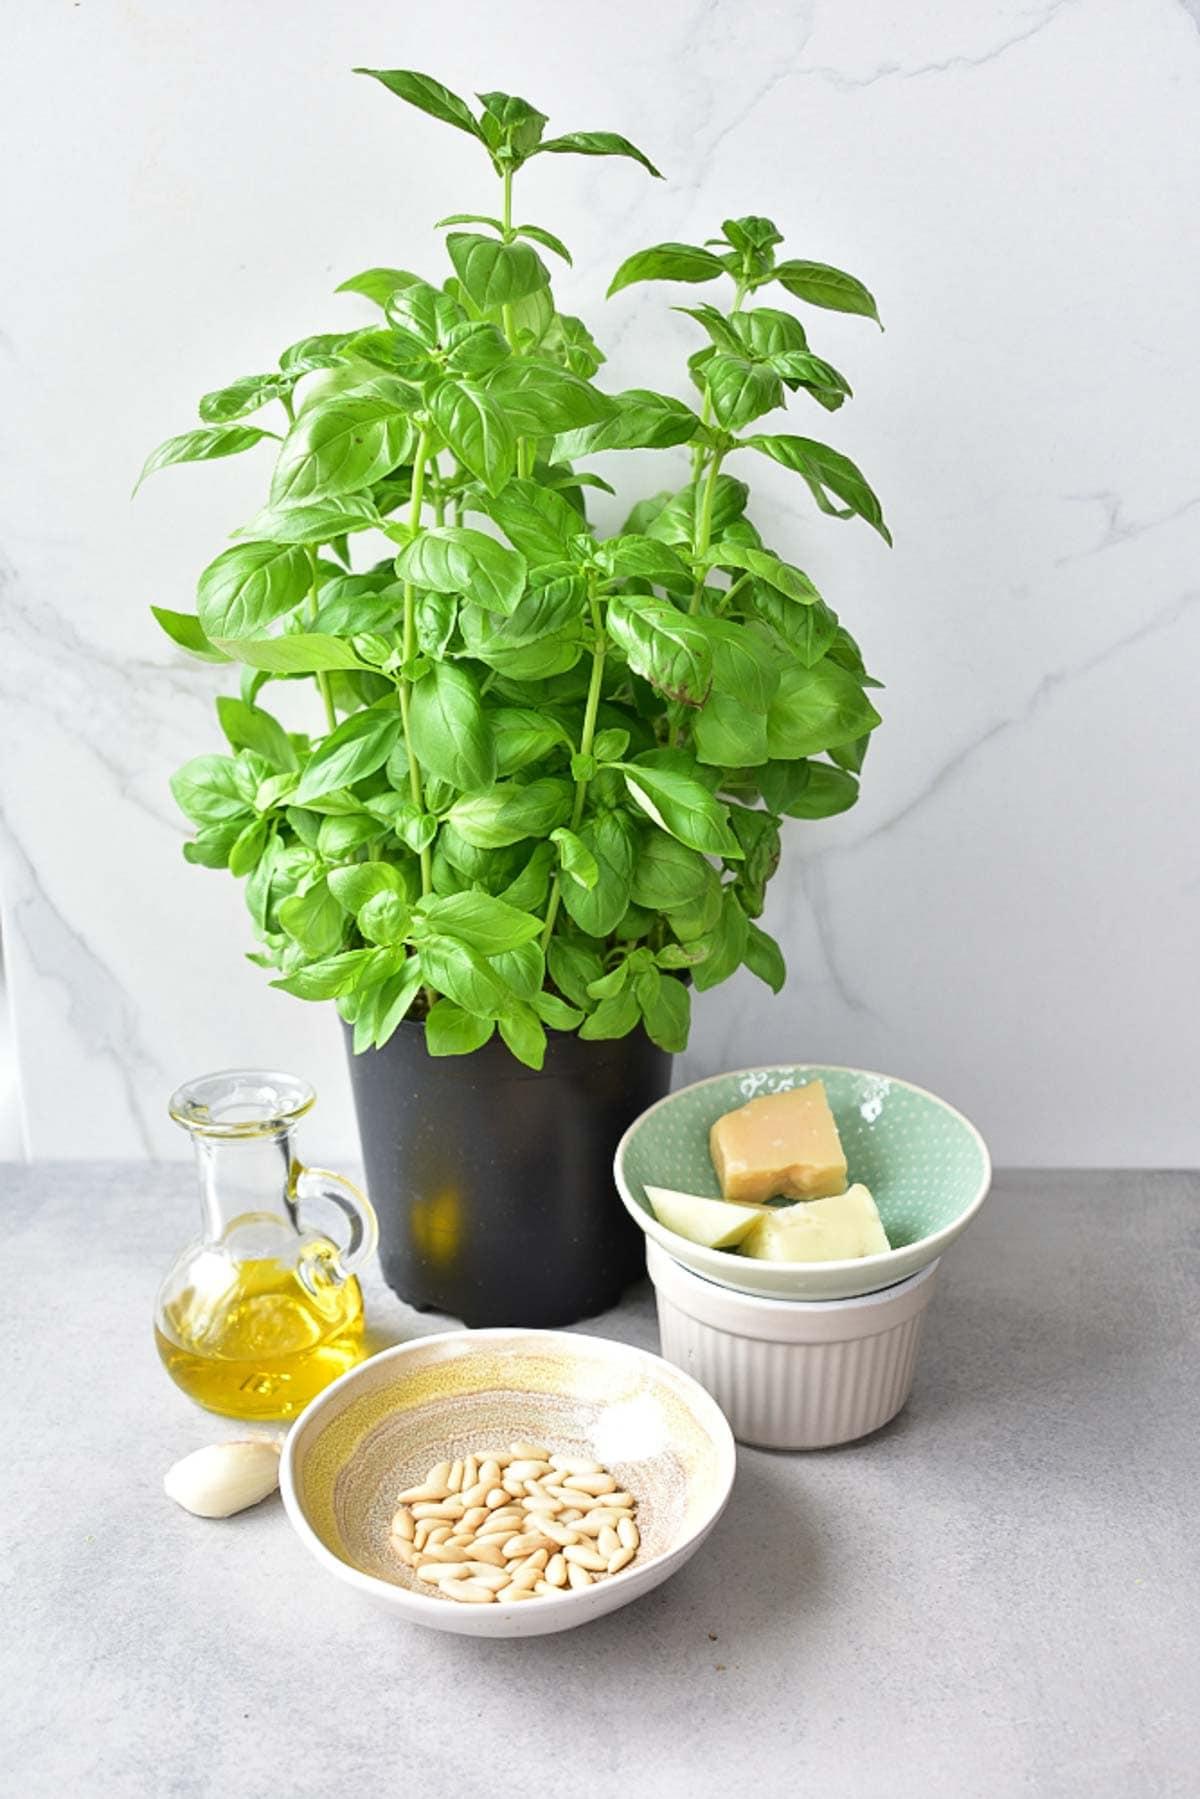 Basil pesto ingredients on a grey background.